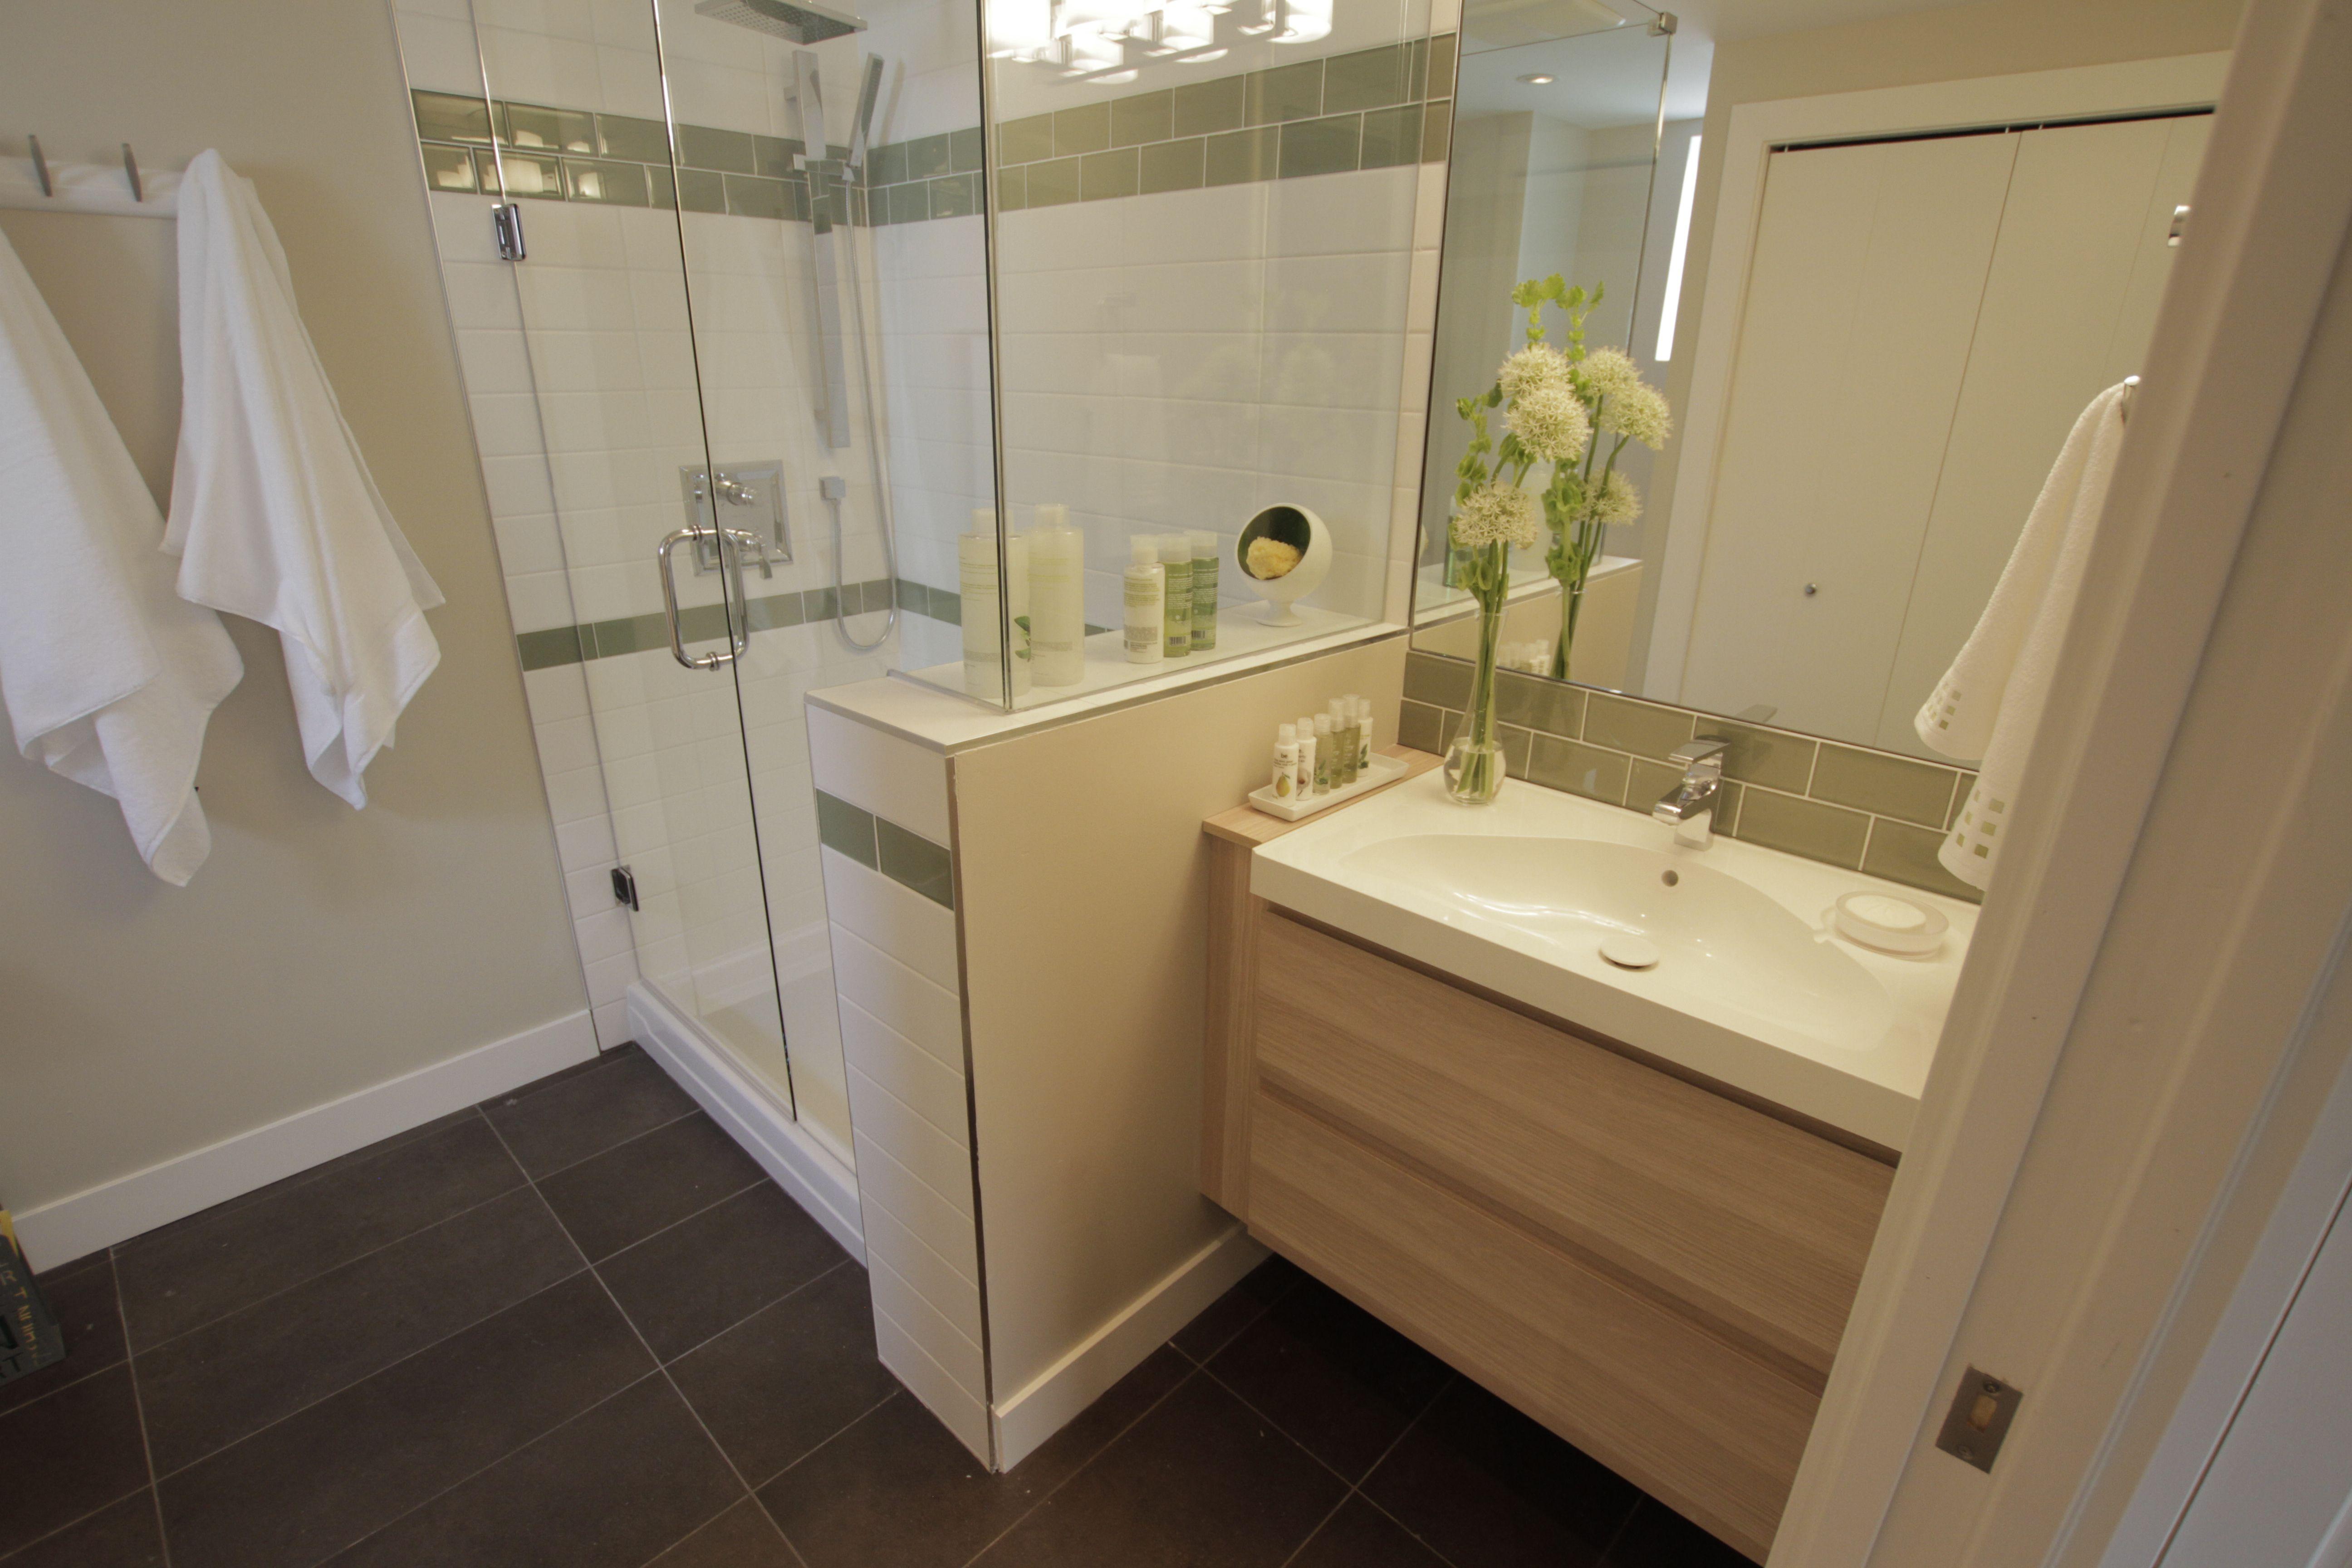 Fantastic Bathroom Remodel As Seen On Property Brothers Episode - Property brothers bathroom remodel